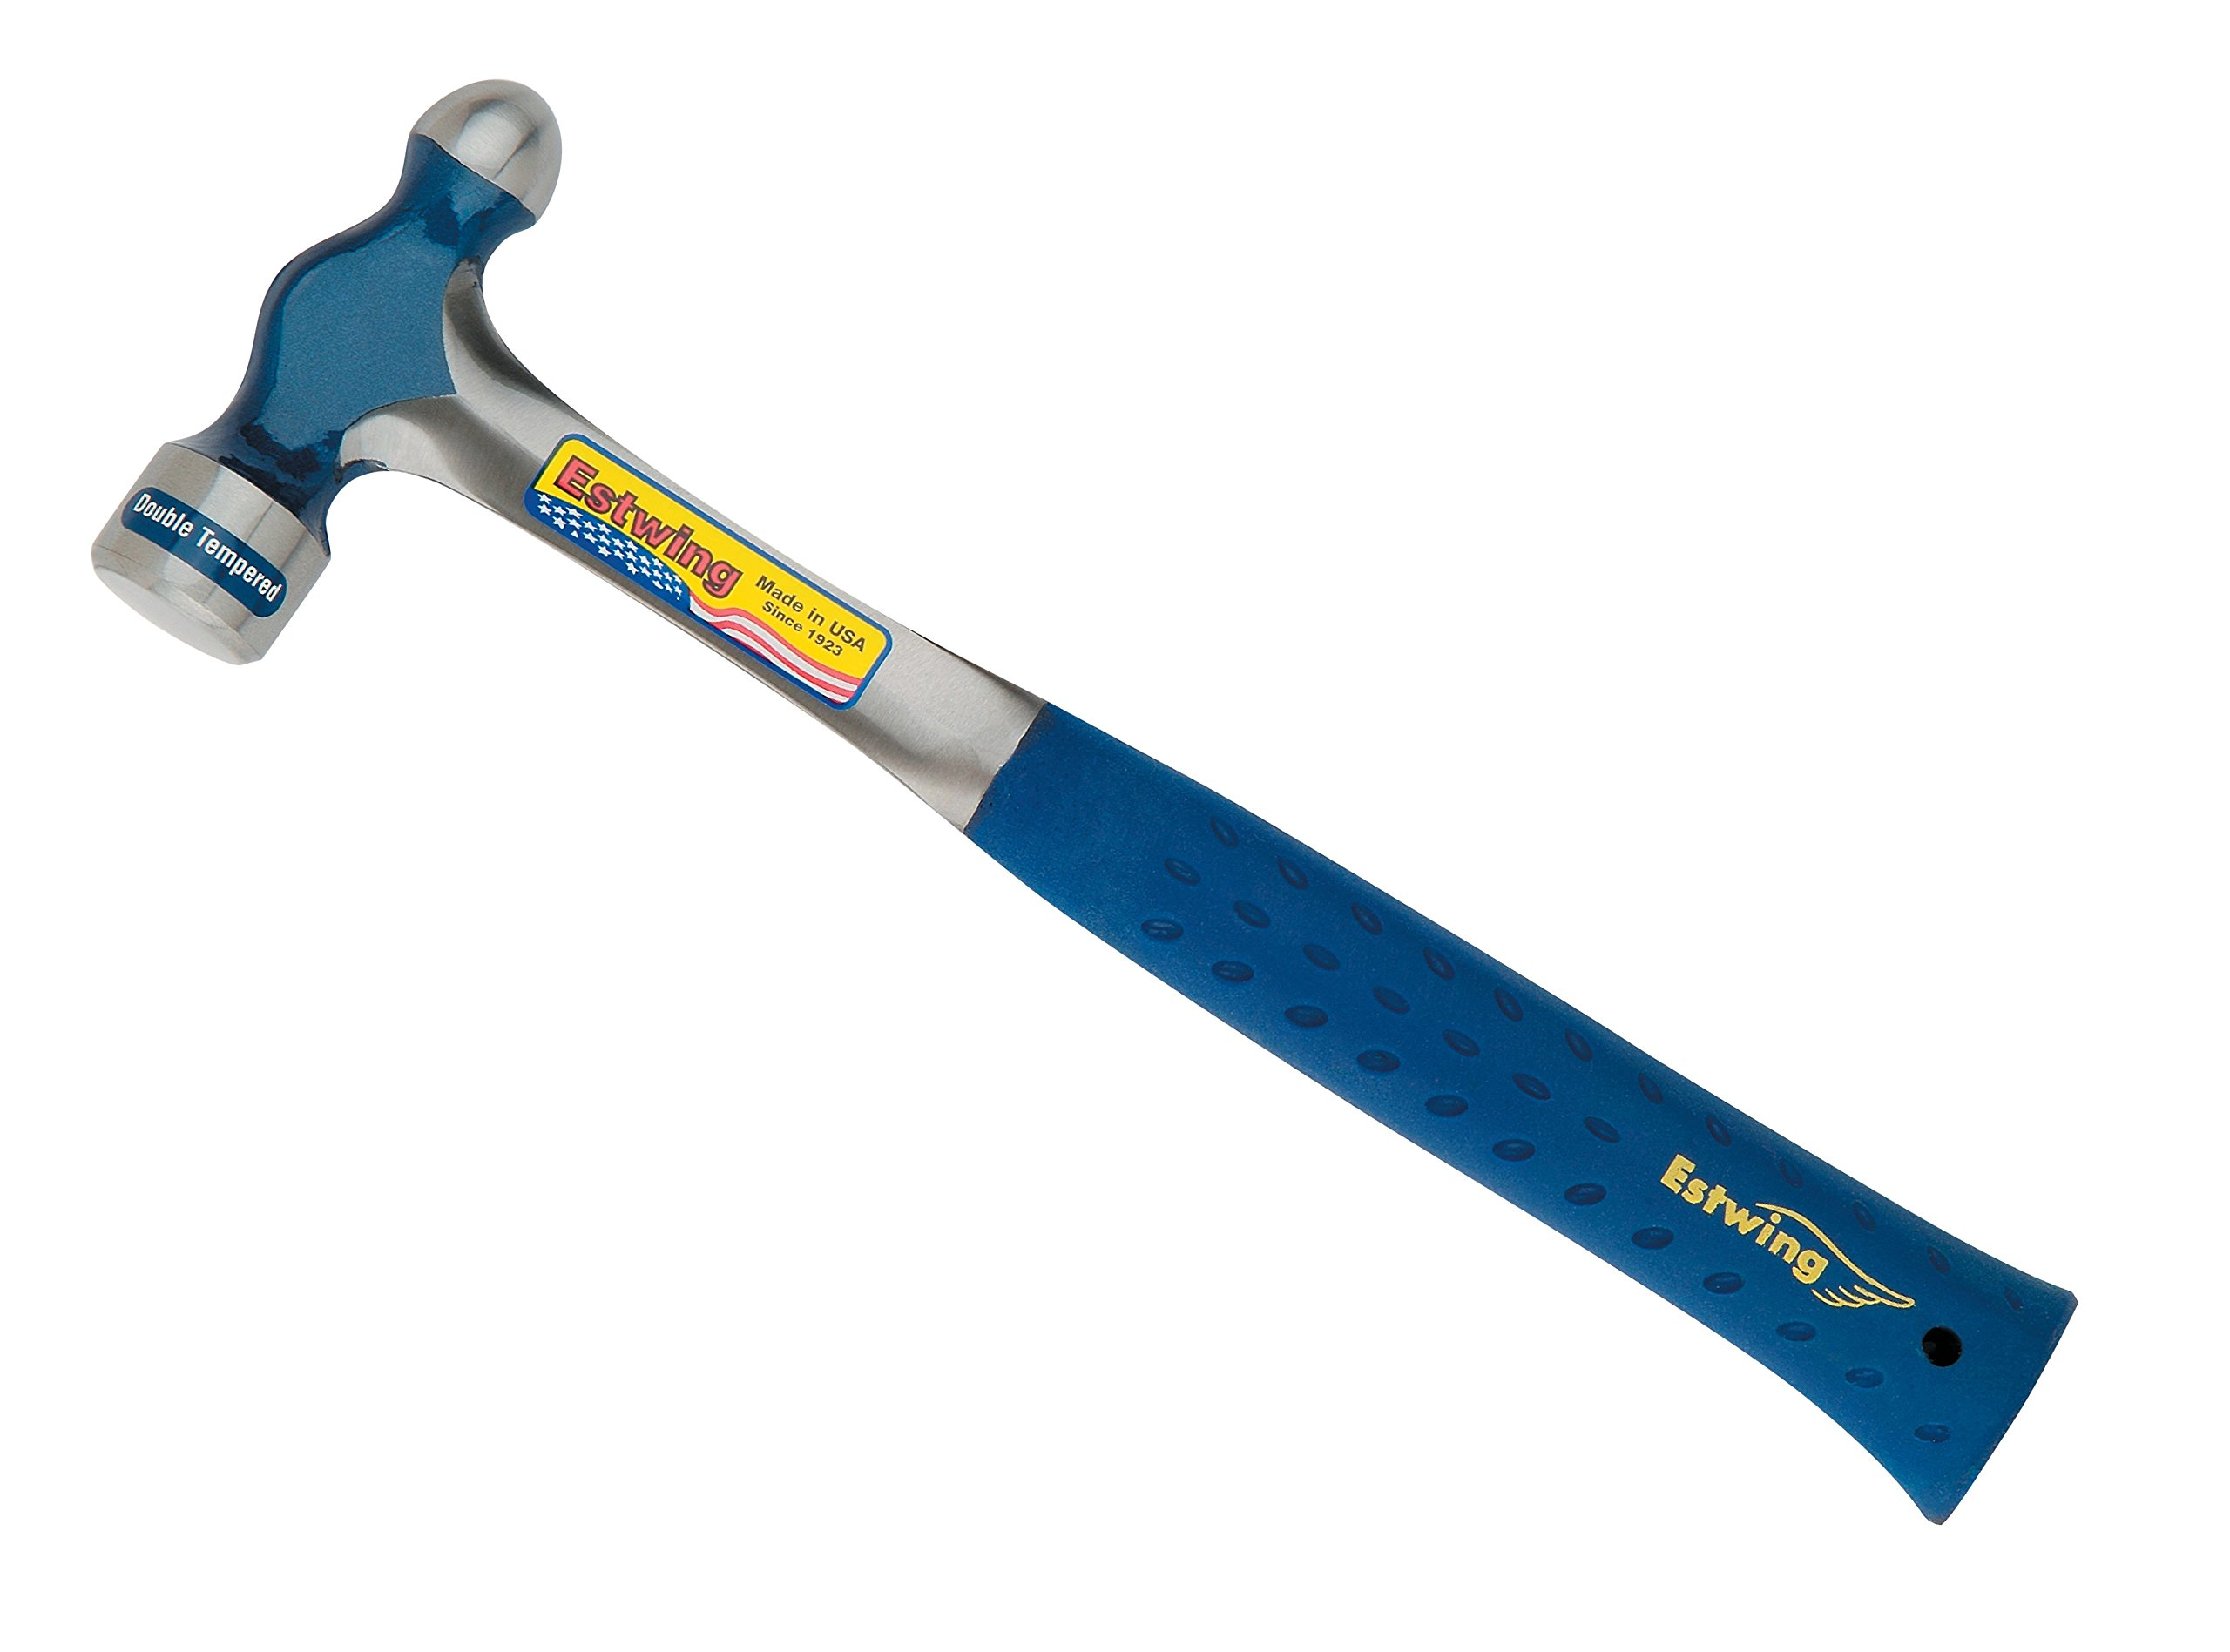 Estwing E3-32BP Ball Pein Hammer, Straight Nylon Vinyl Handle, 14 1/2'', Steel 32 oz. Head, Blue